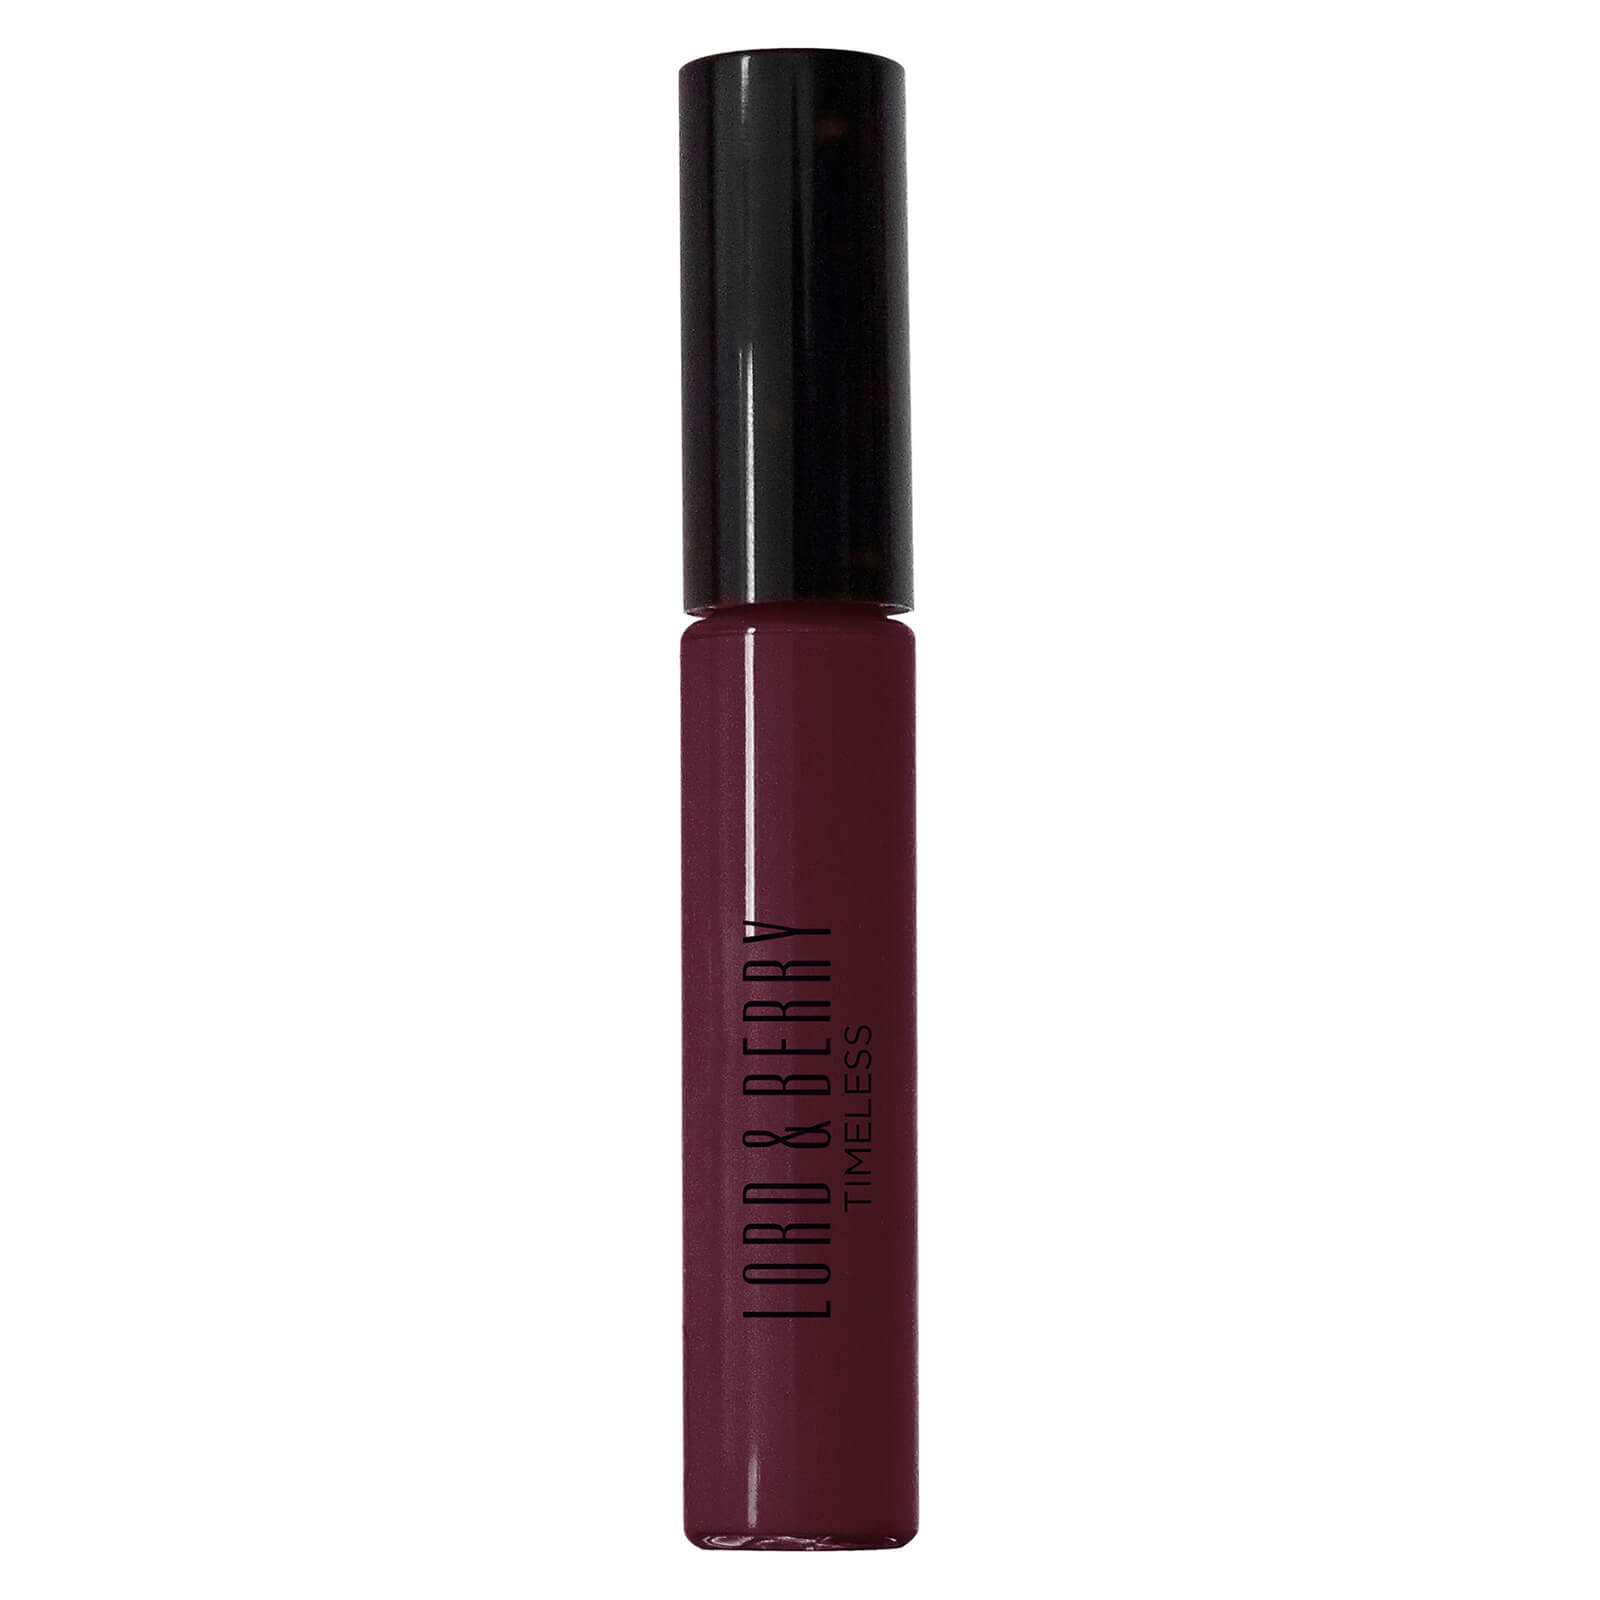 Купить Lord & Berry Timeless Kissproof Lipstick Помада для губ - Knockout